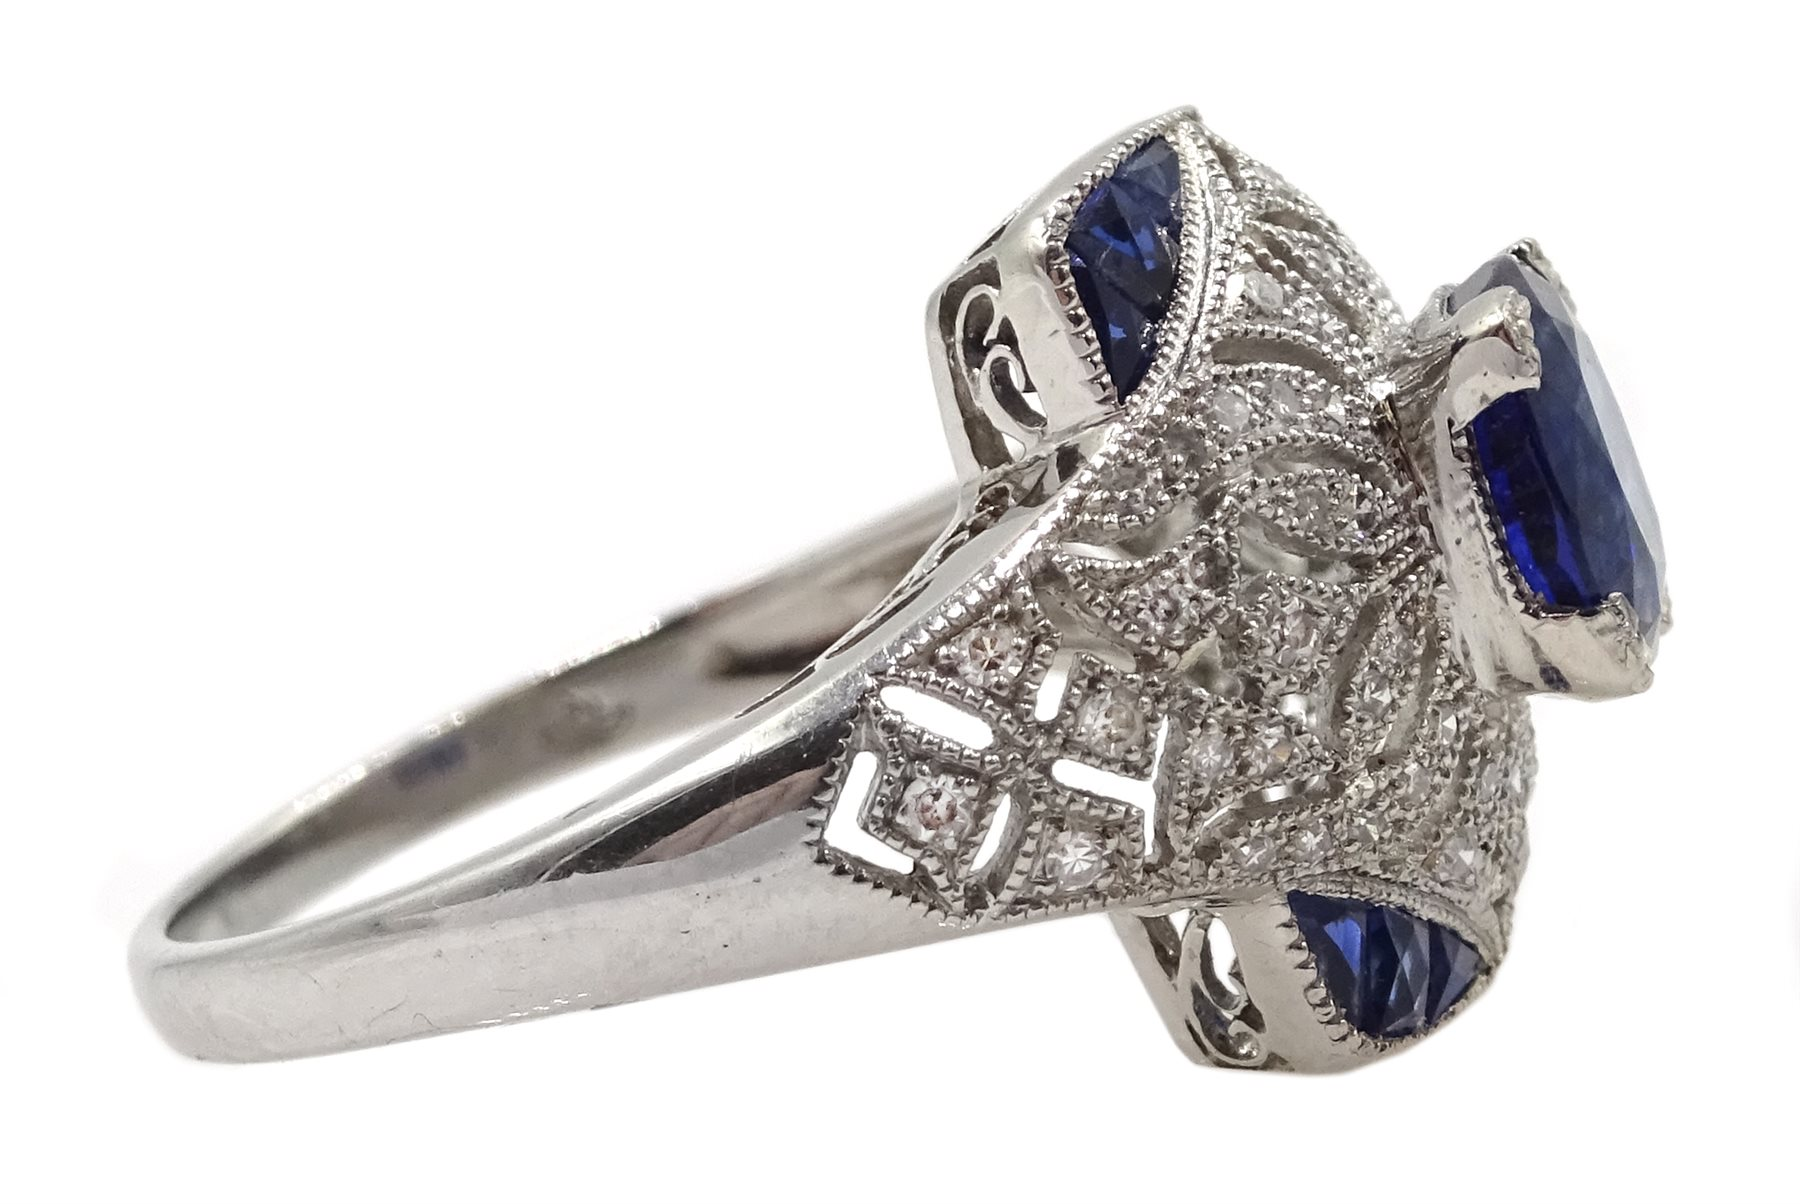 Platinum sapphire and diamond dress ring, pierced openwork setting, free UK mainland shipping - Image 4 of 6